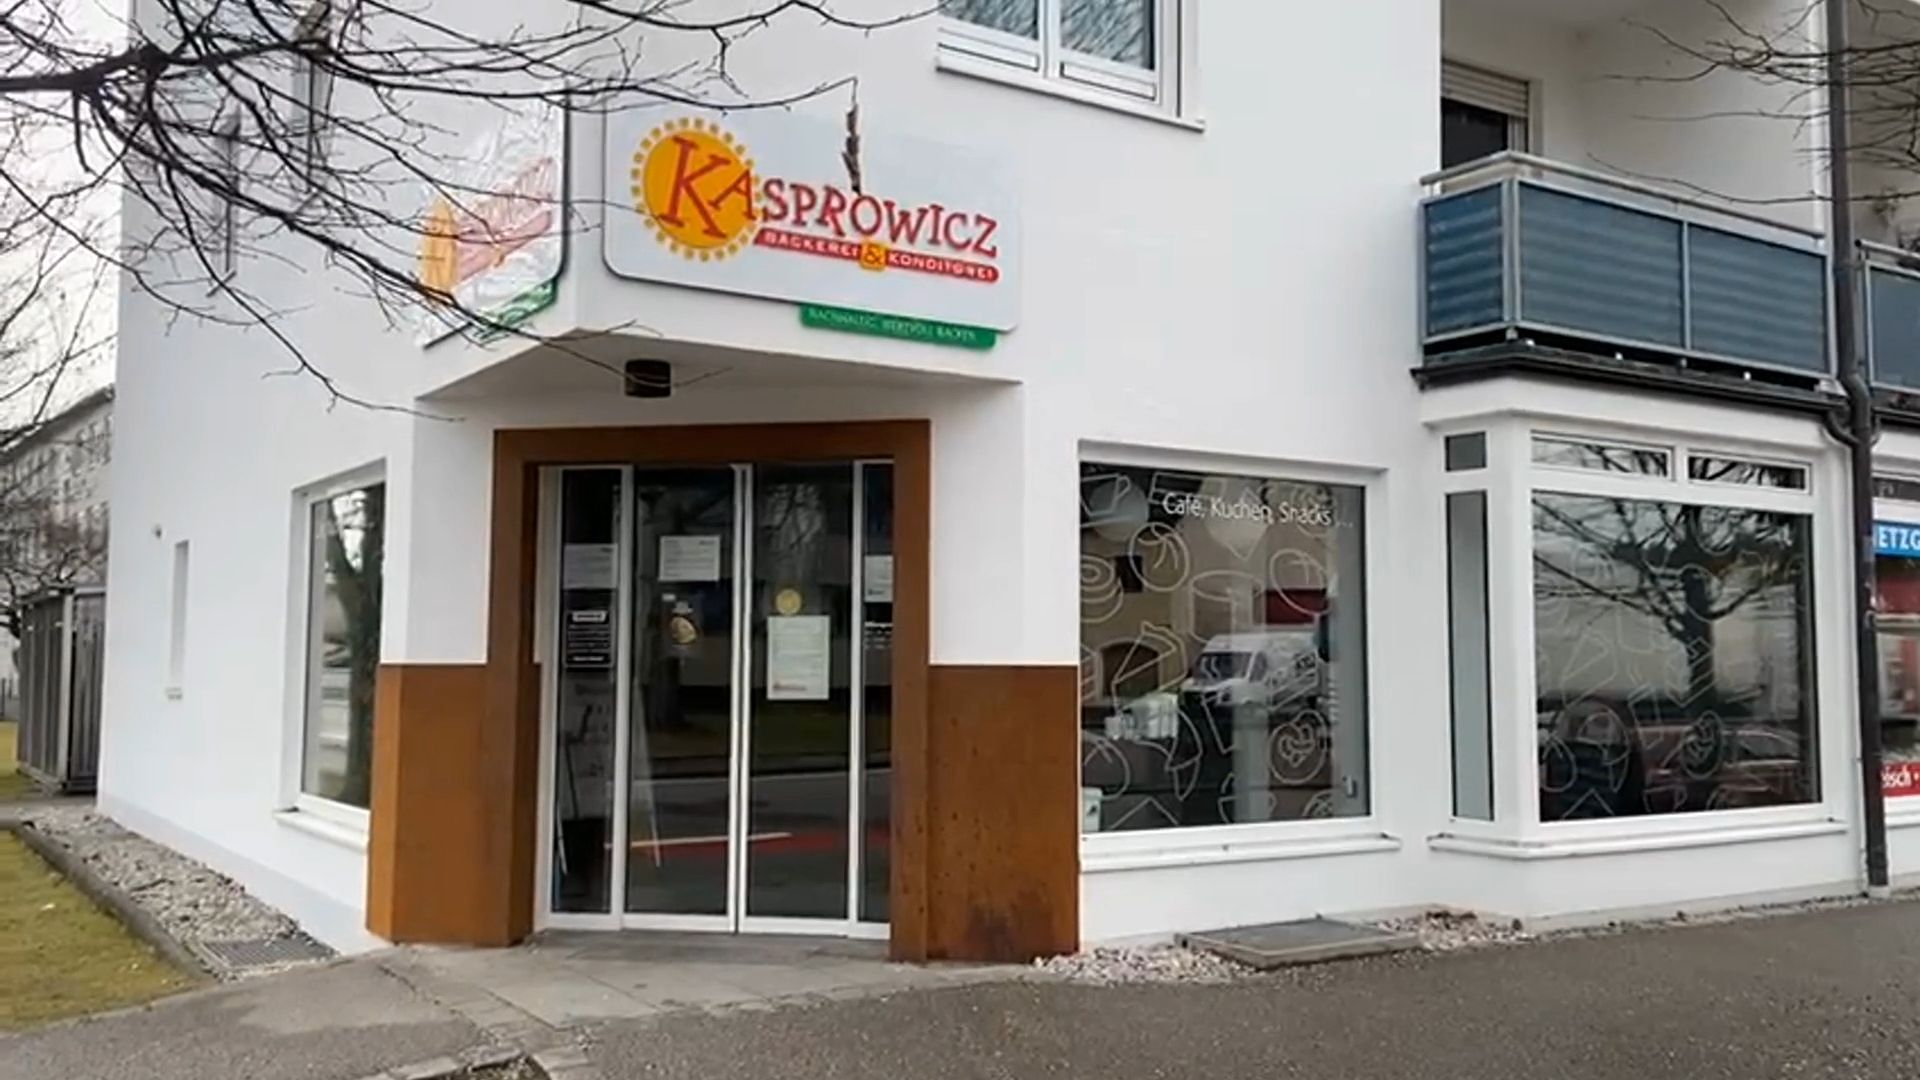 Virus-Mutation in Bäckerei? 16 Mitarbeiter mit Corona infiziert – alle Filialen geschlossen